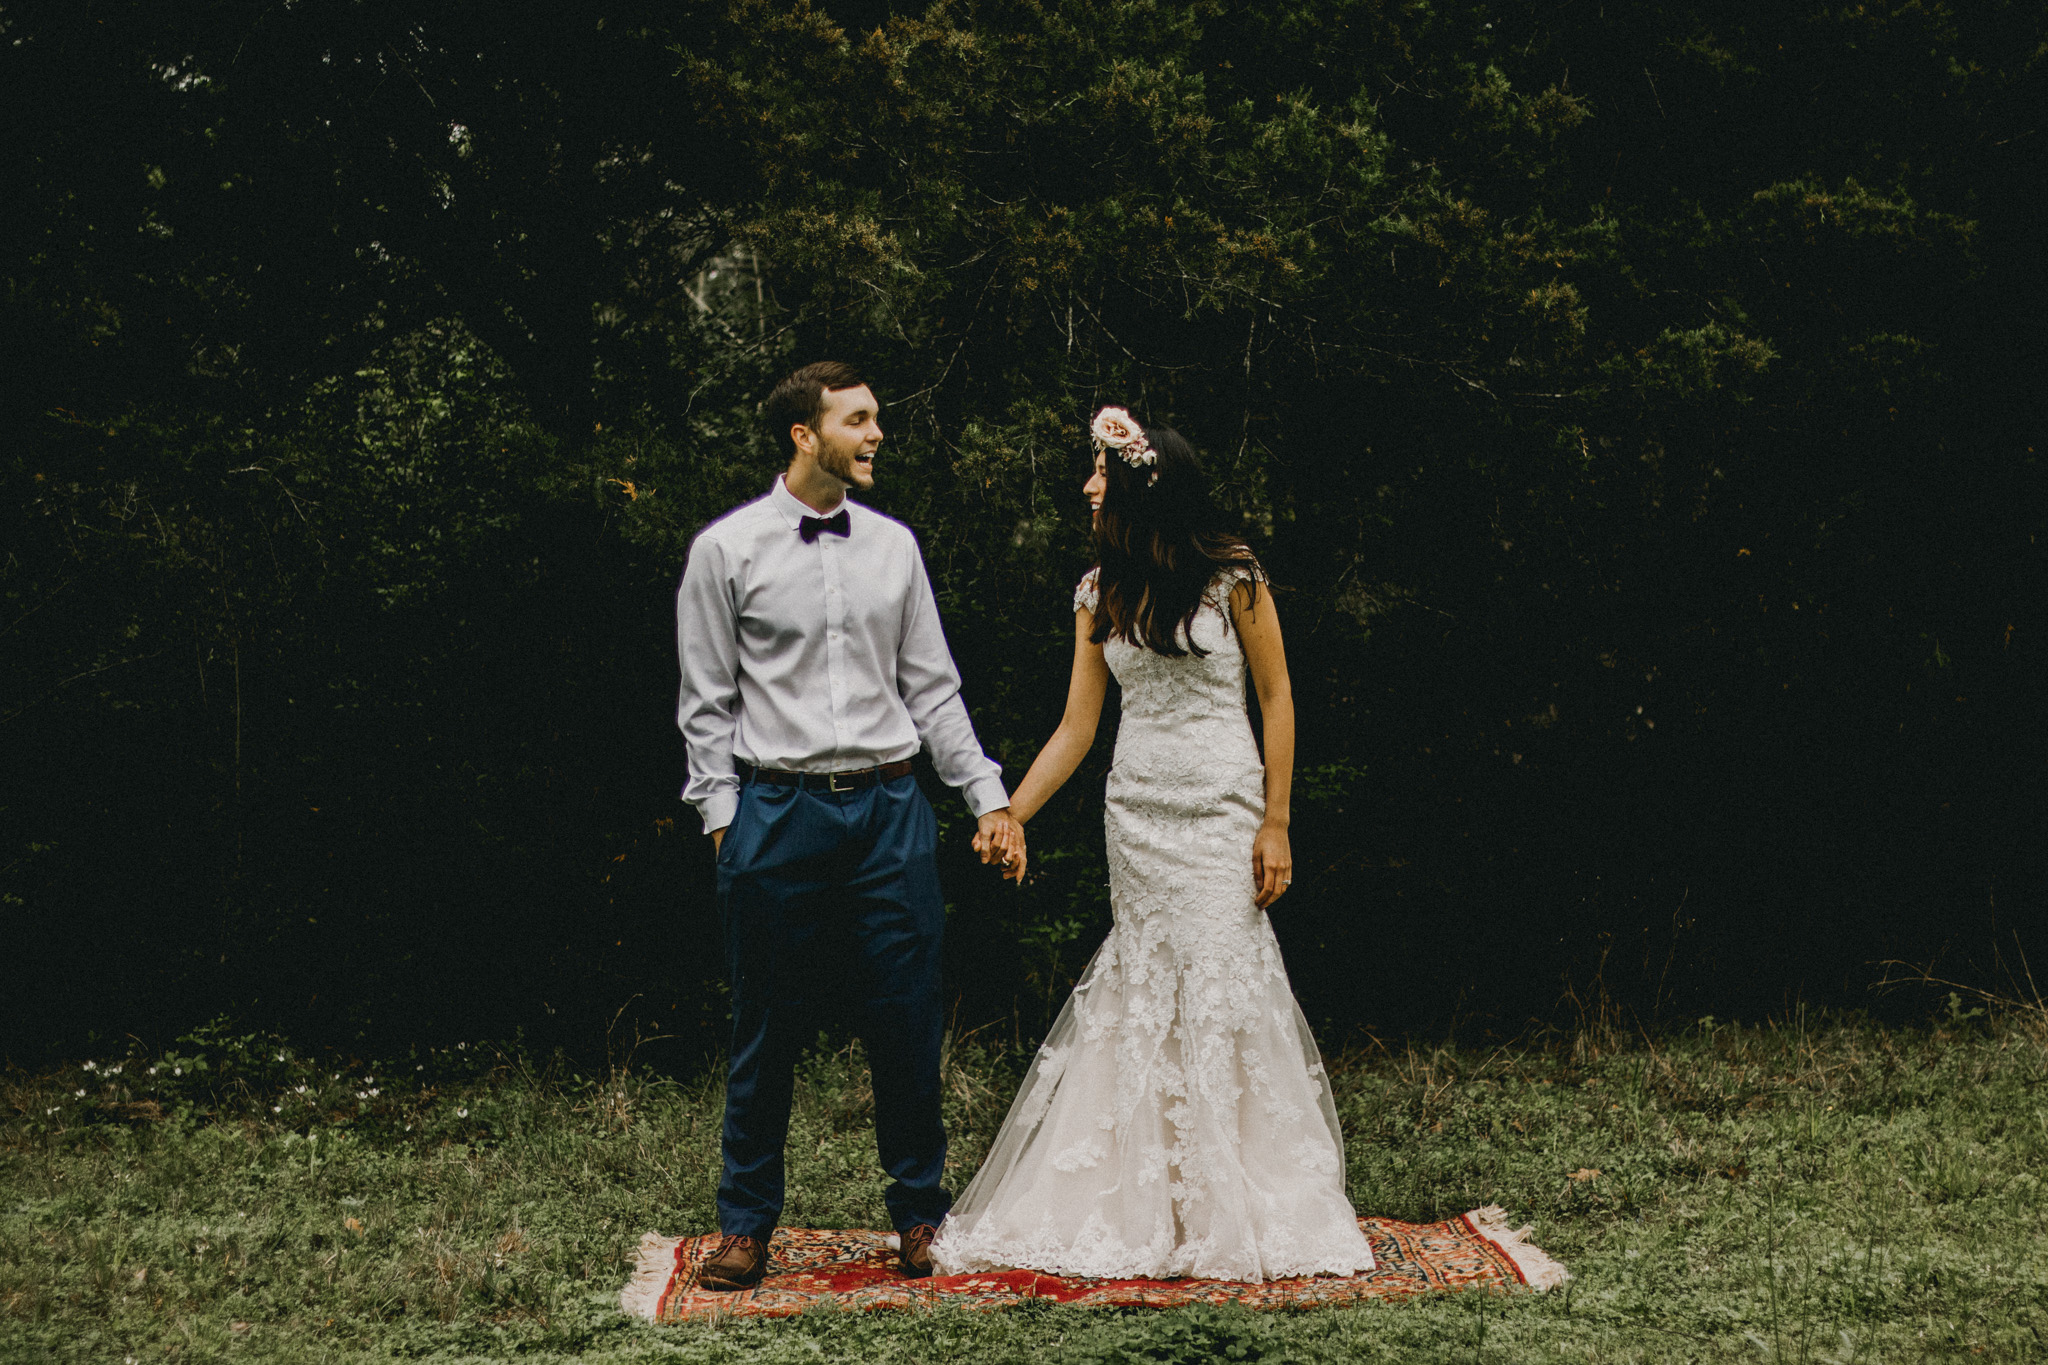 Breshears After Bridal Session Blog-33.jpg